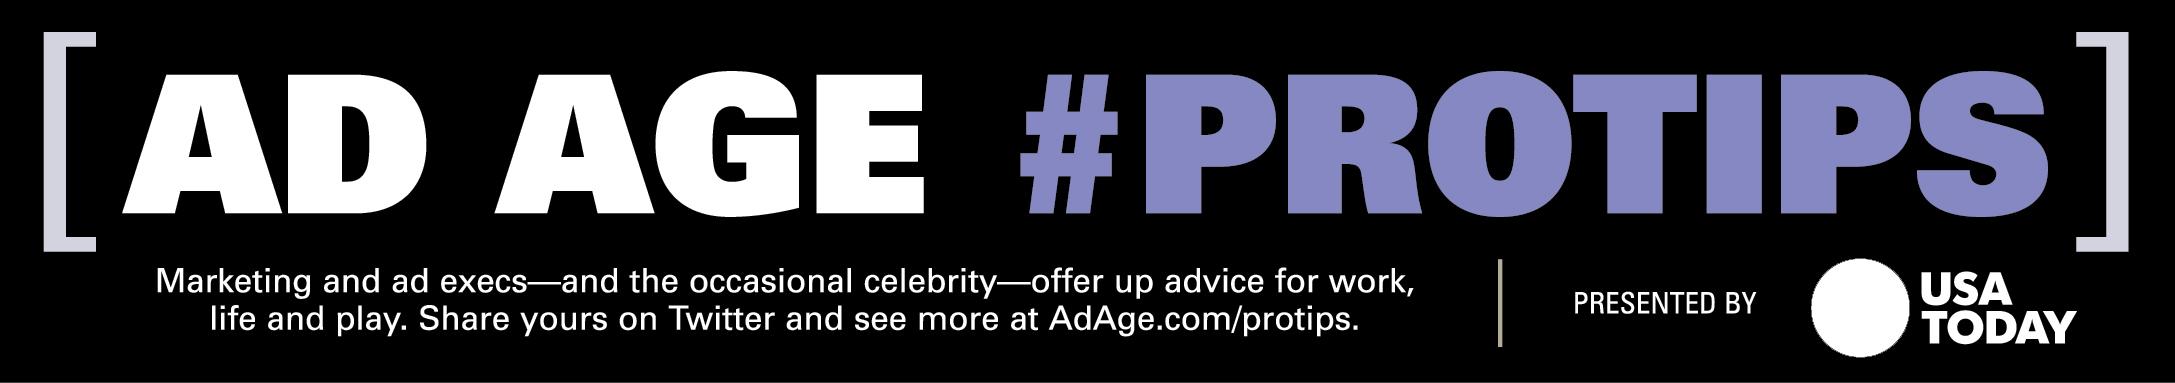 Ad Age #PROTIPS header